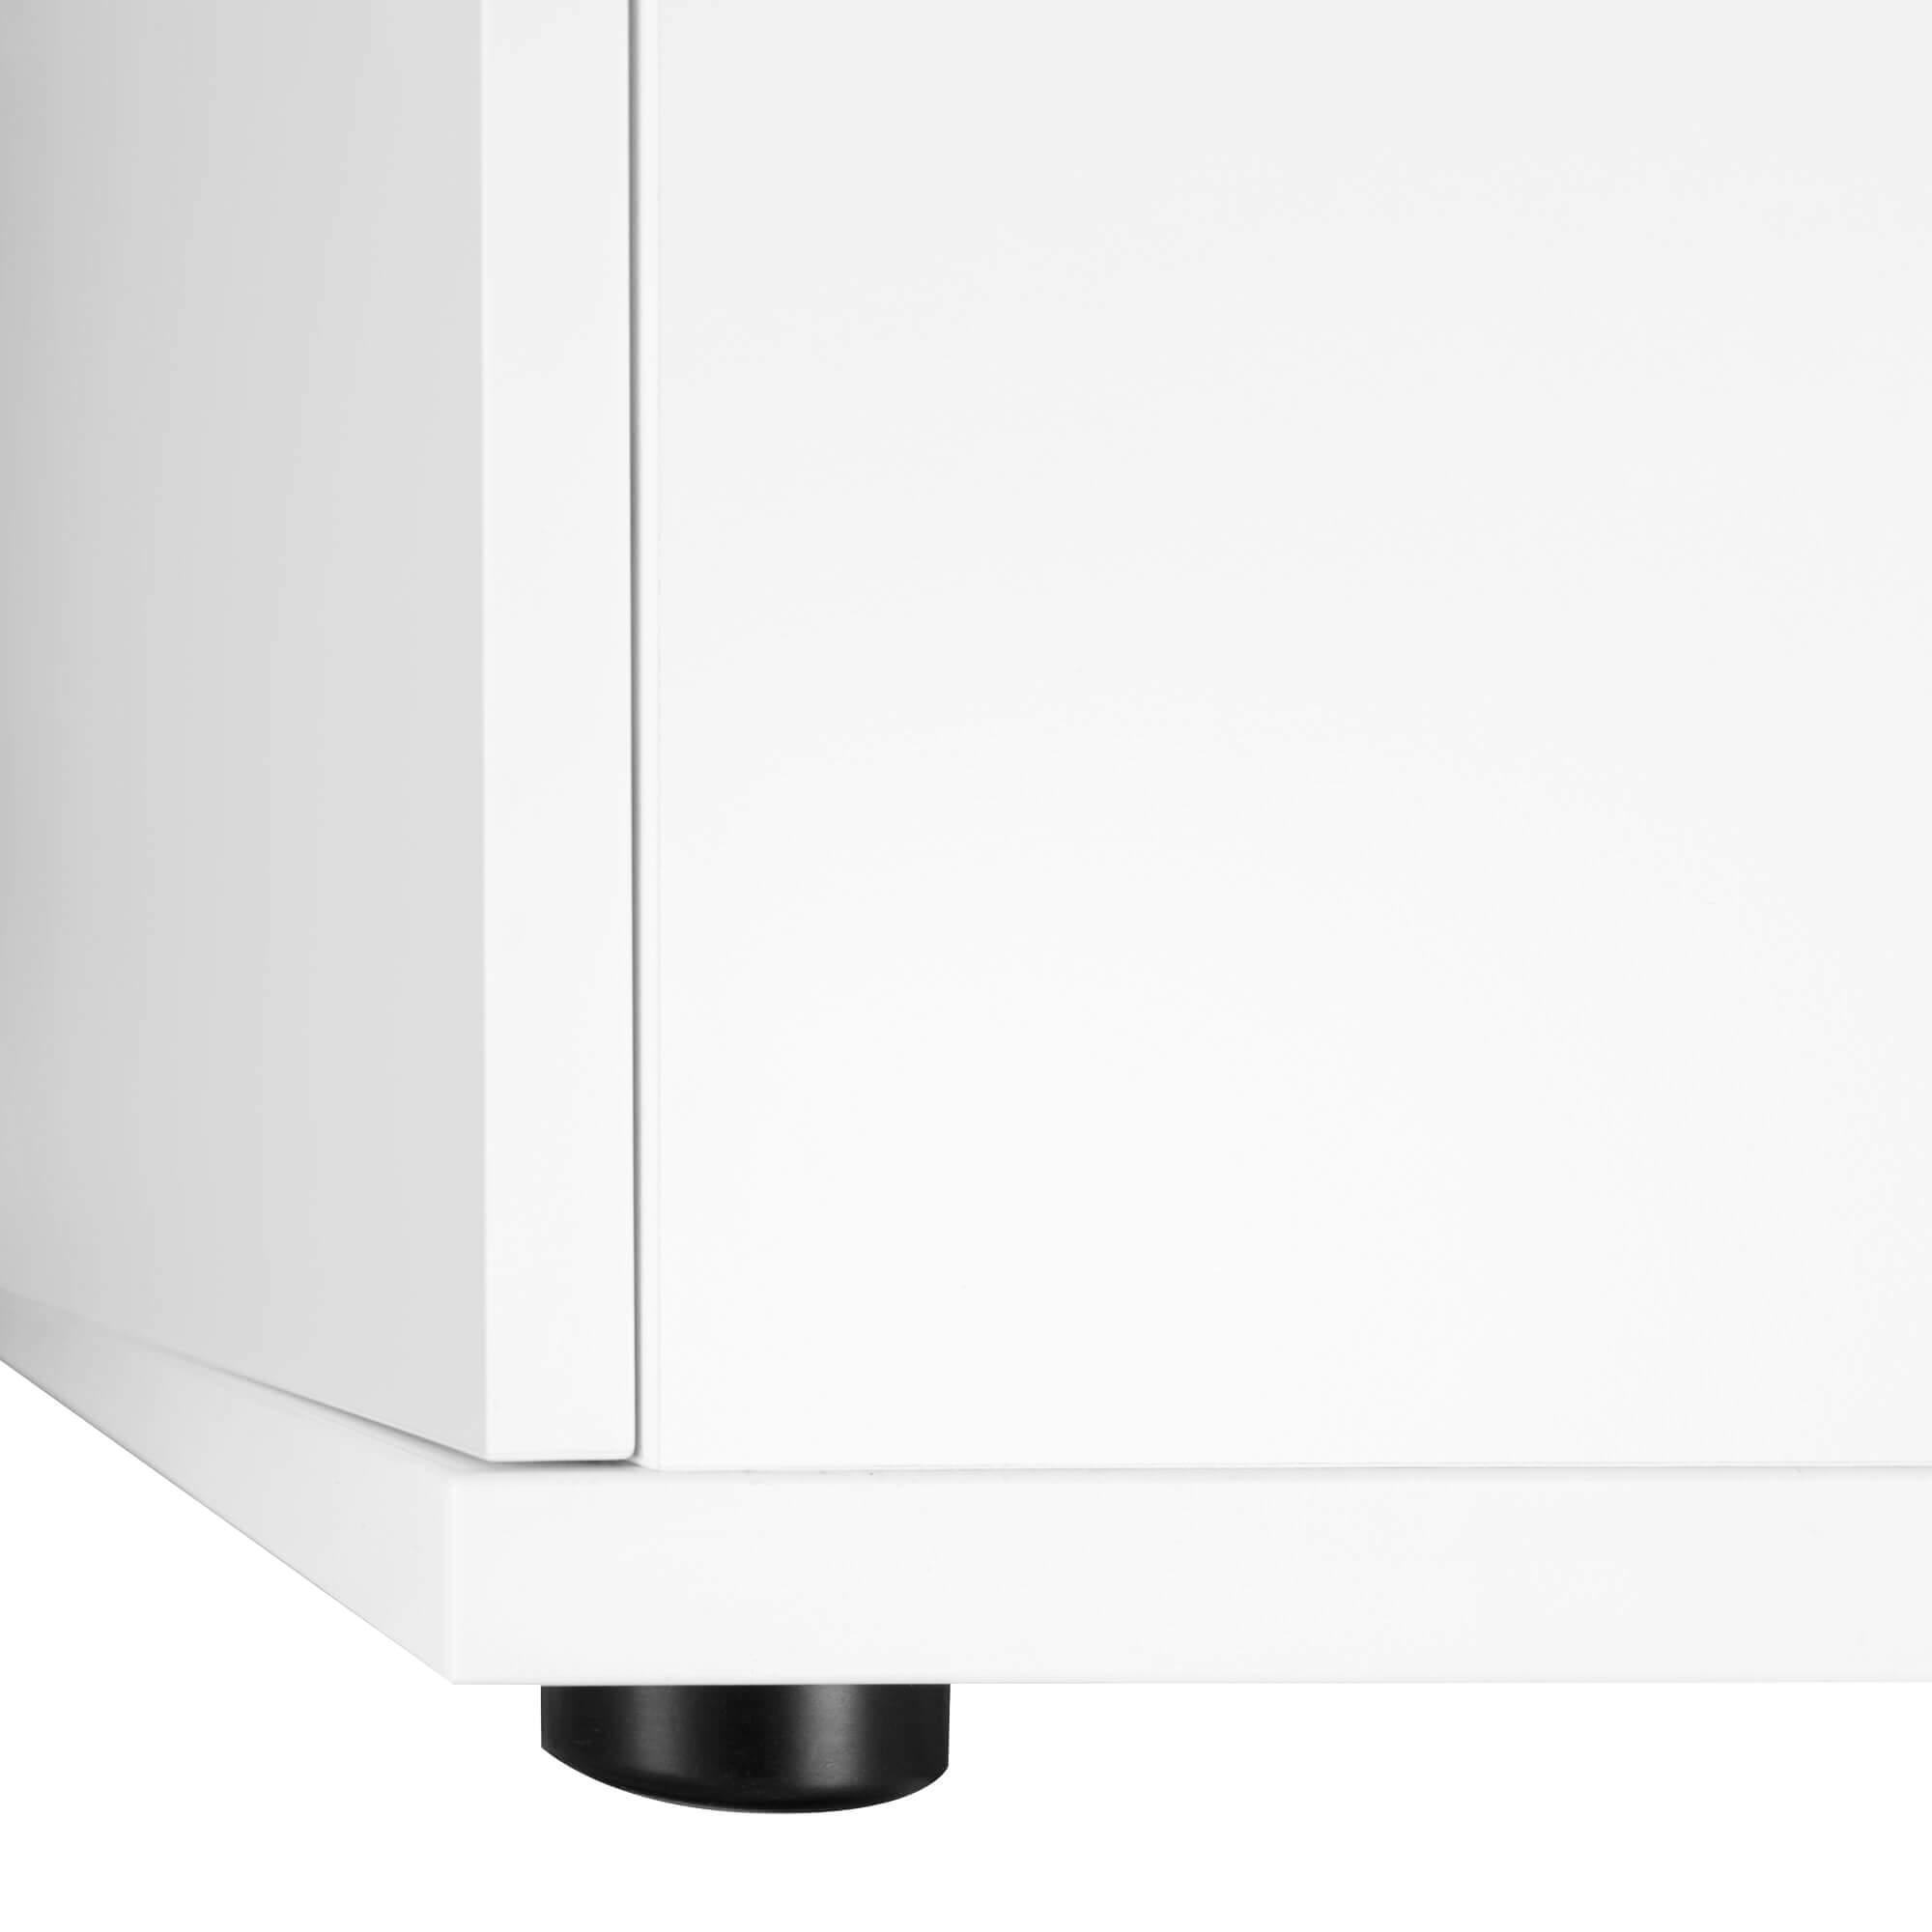 UNI Aktenschrank abschließbar 5 OH Weiß Schrank Büroschrank Flügeltürenschrank